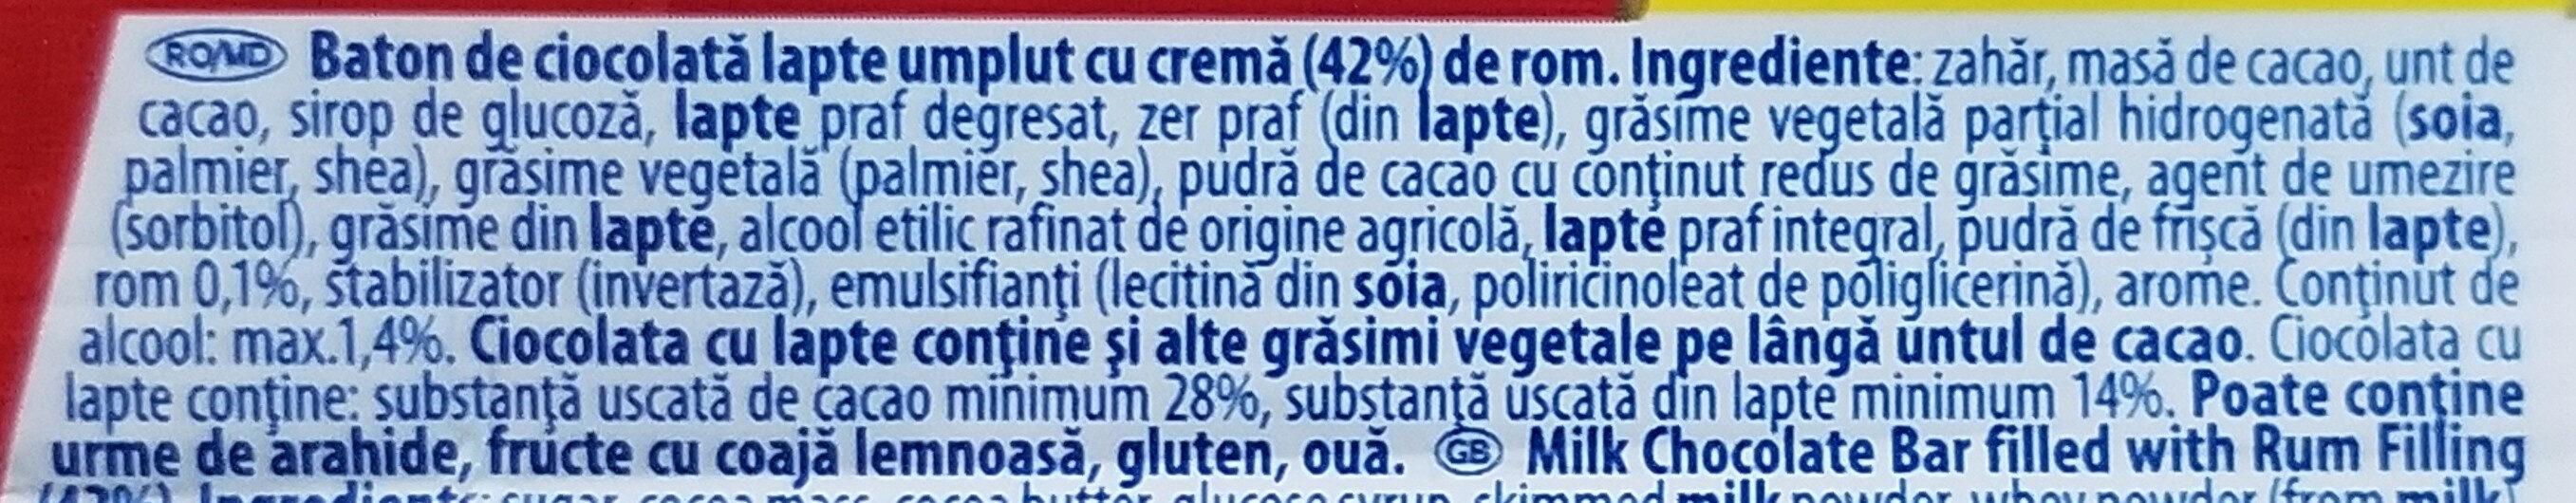 Rom ciocolată cu lapte - Ingrédients